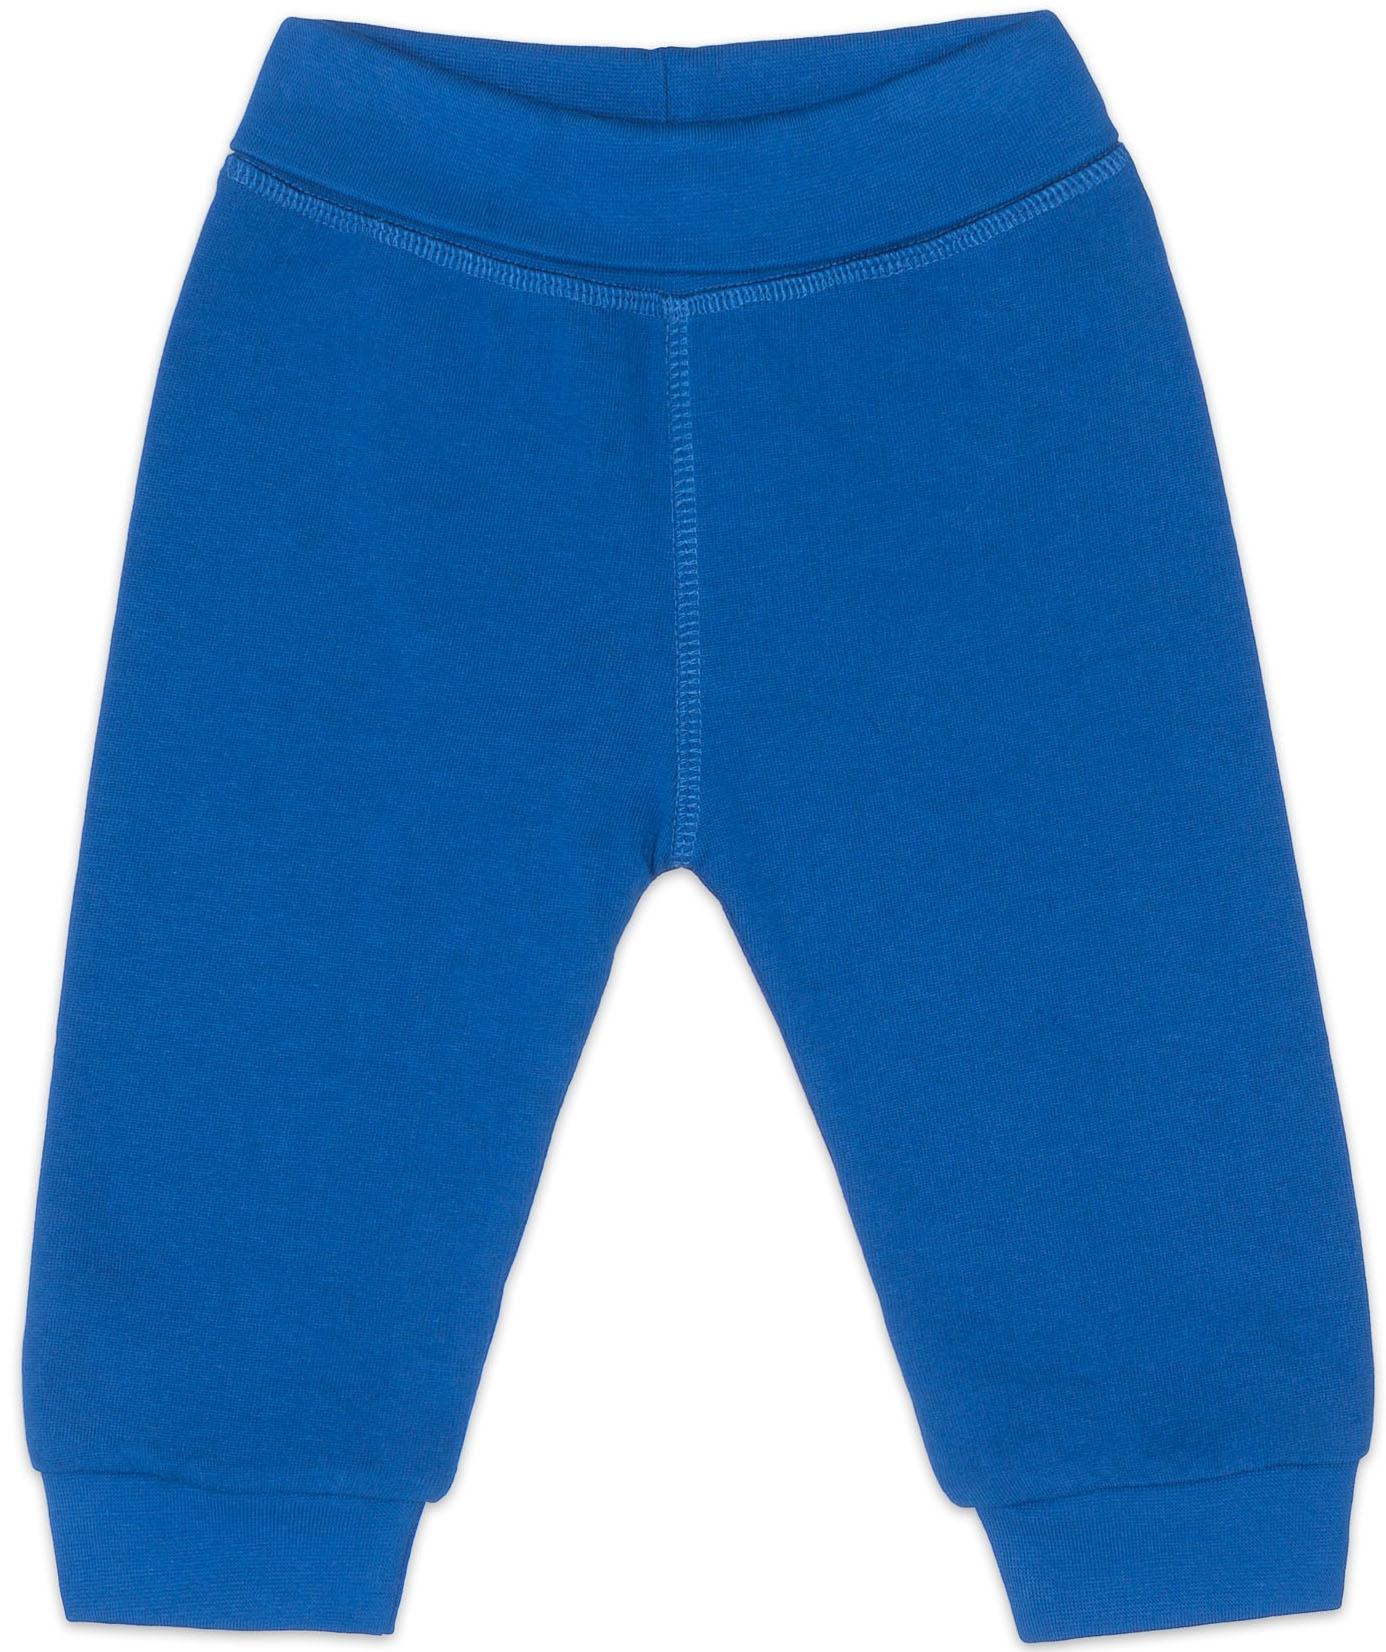 Брюки Barkito Брюки трикотажные для мальчика Barkito, Динозаврики, синие брюки barkito брюки трикотажные для мальчика barkito супер baby серые с рисунком